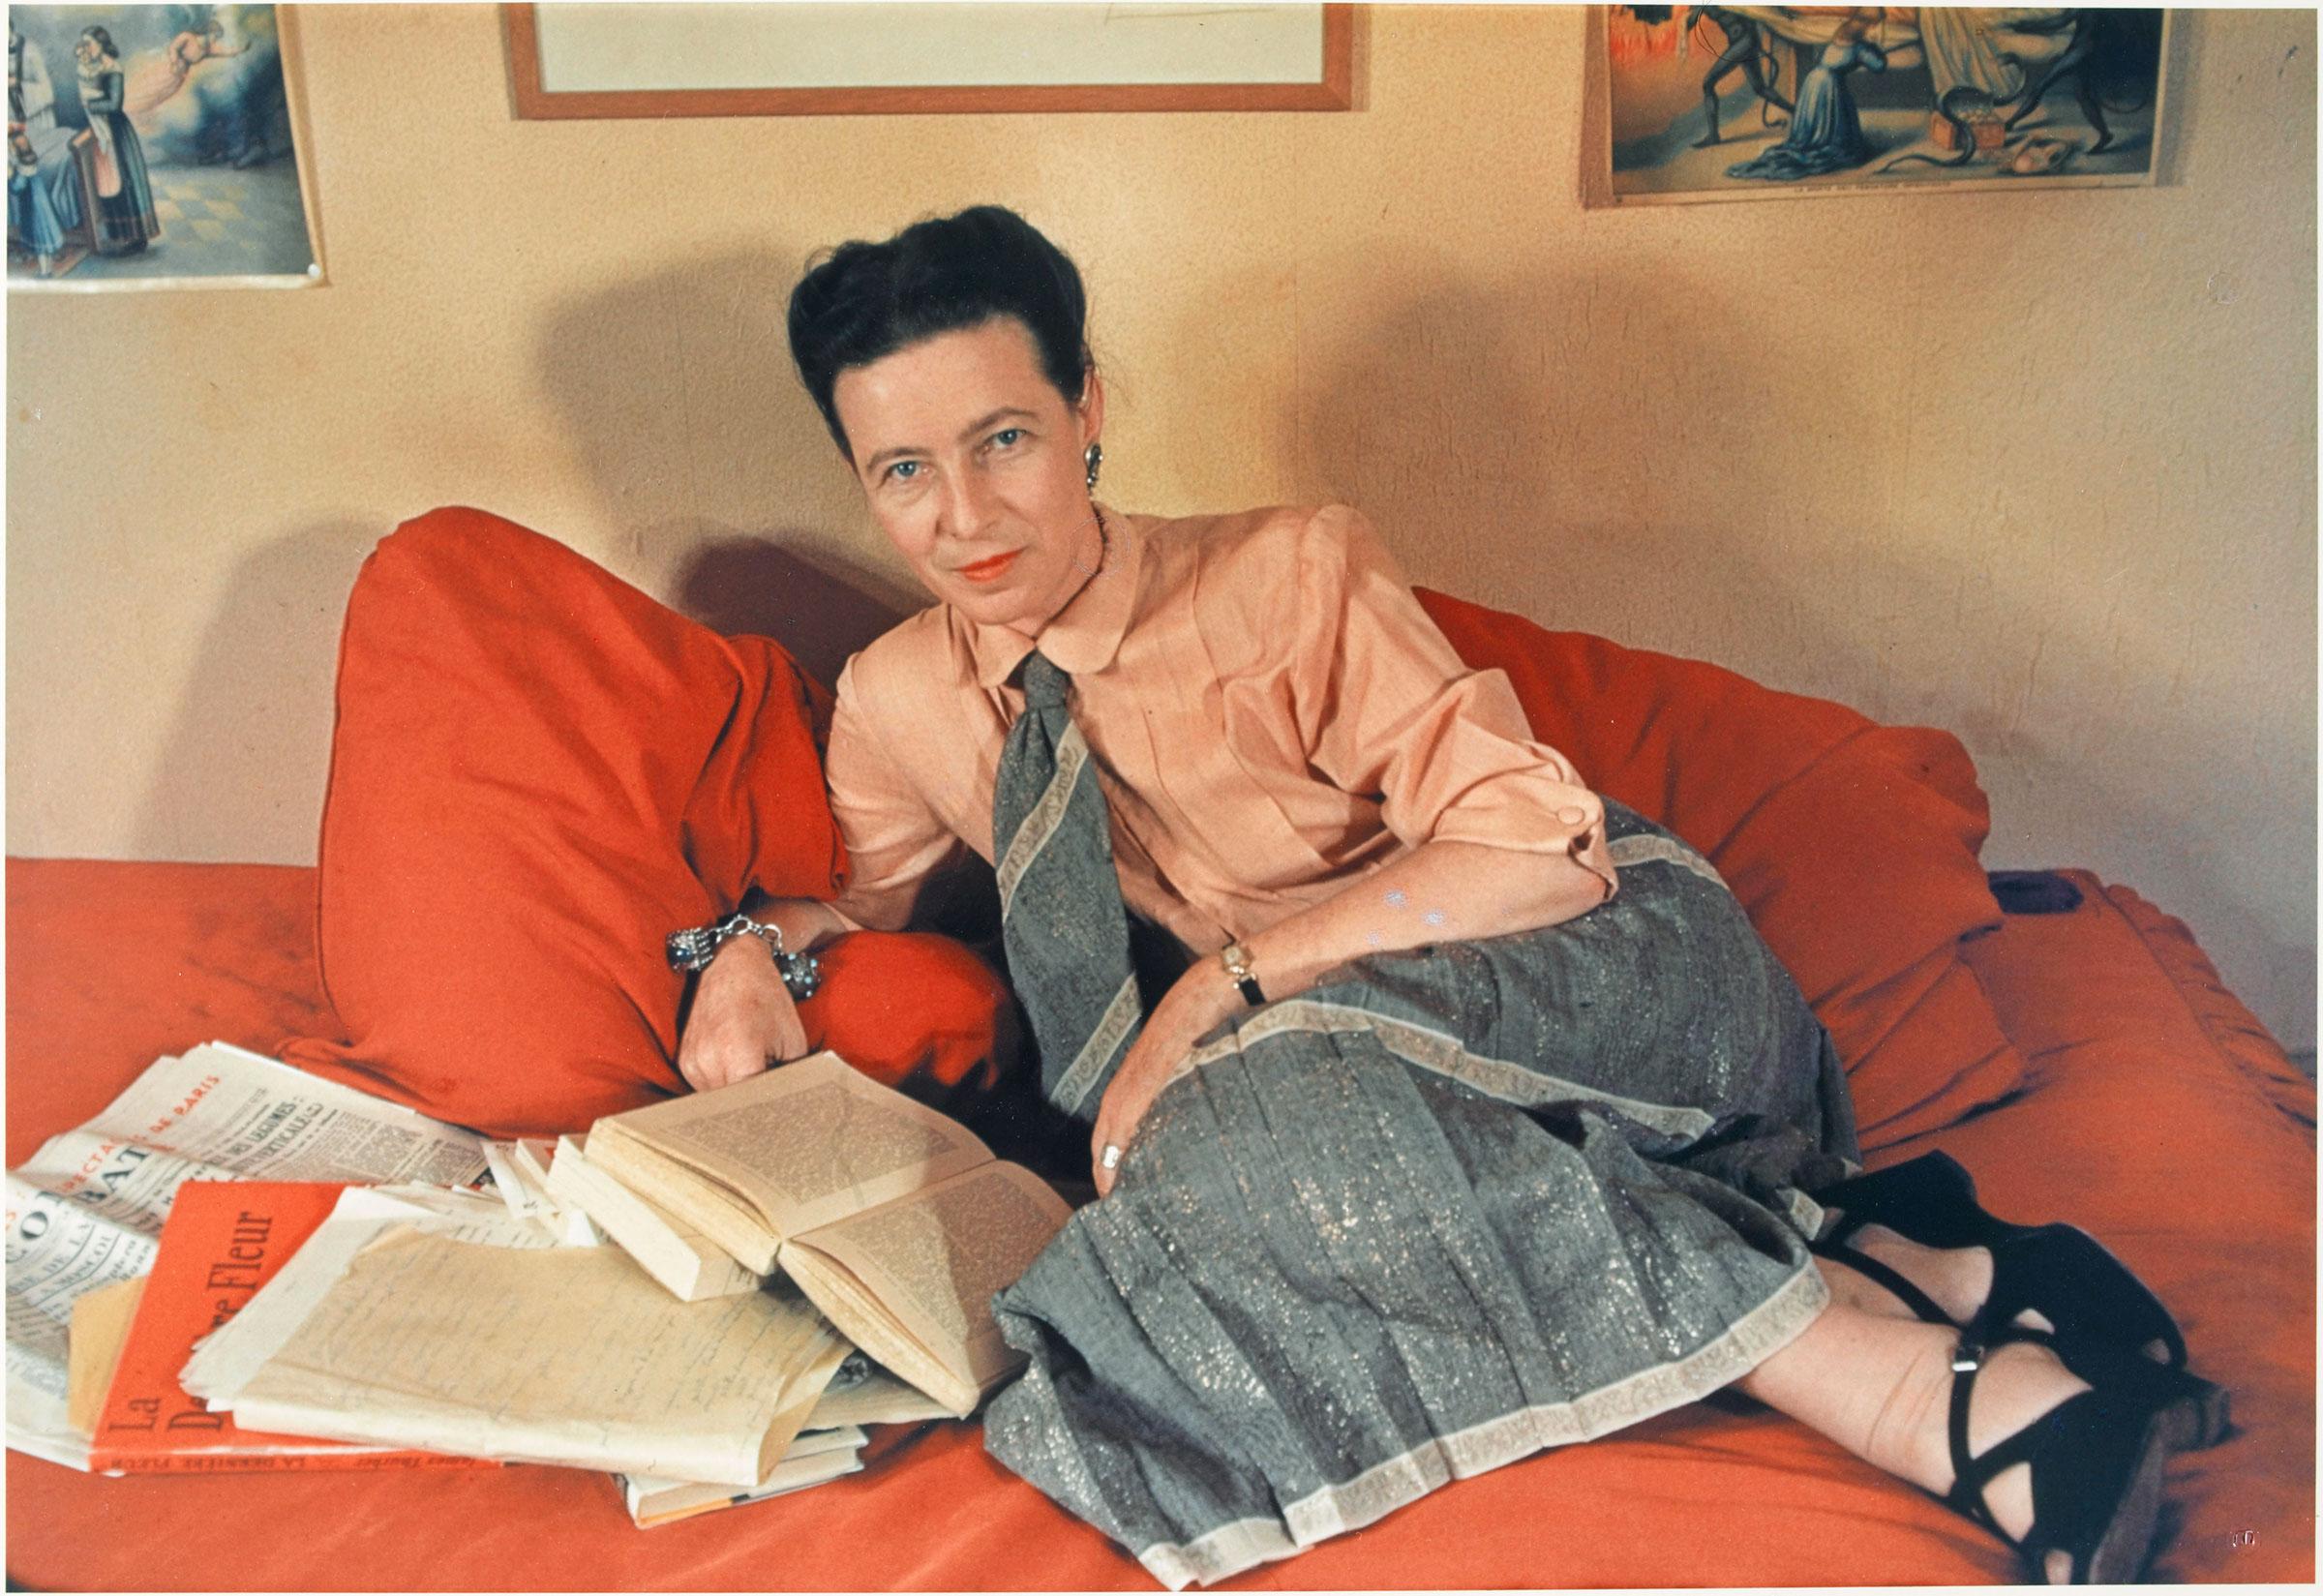 de Beauvoir in Paris in 1948.